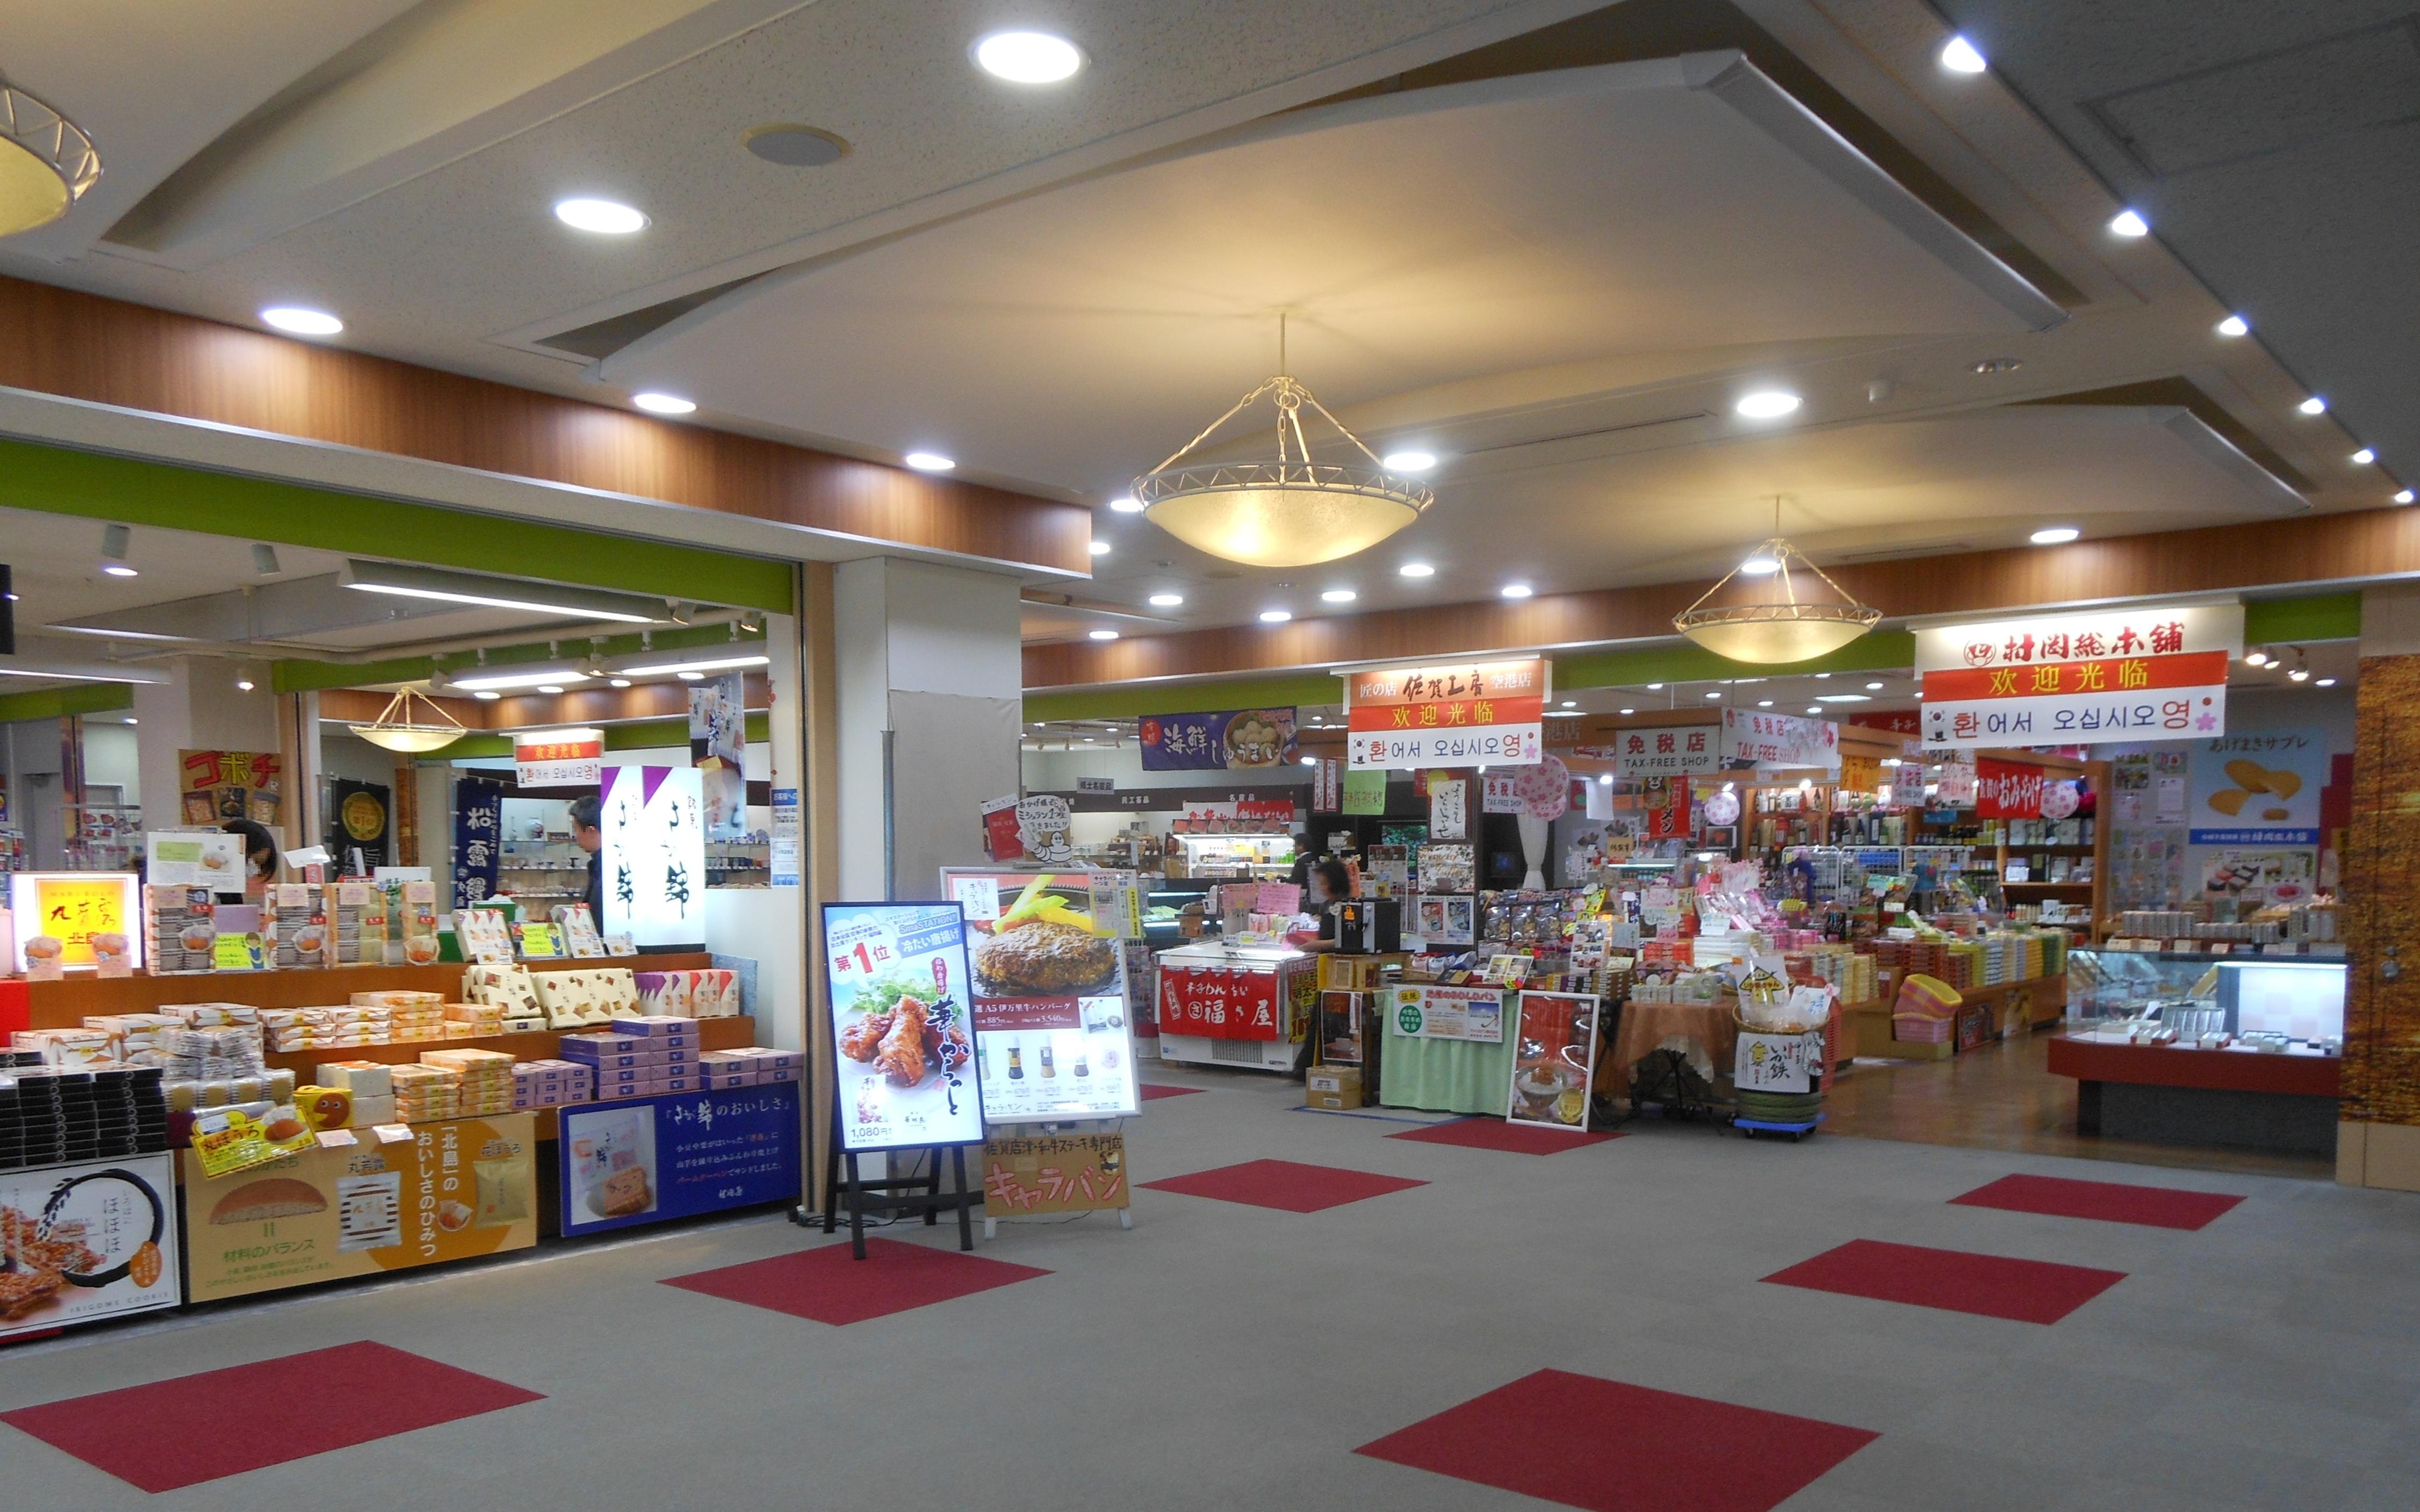 Gift shops in saga airport february 2016g wikipedia gift shops in saga airport february 2016g negle Images